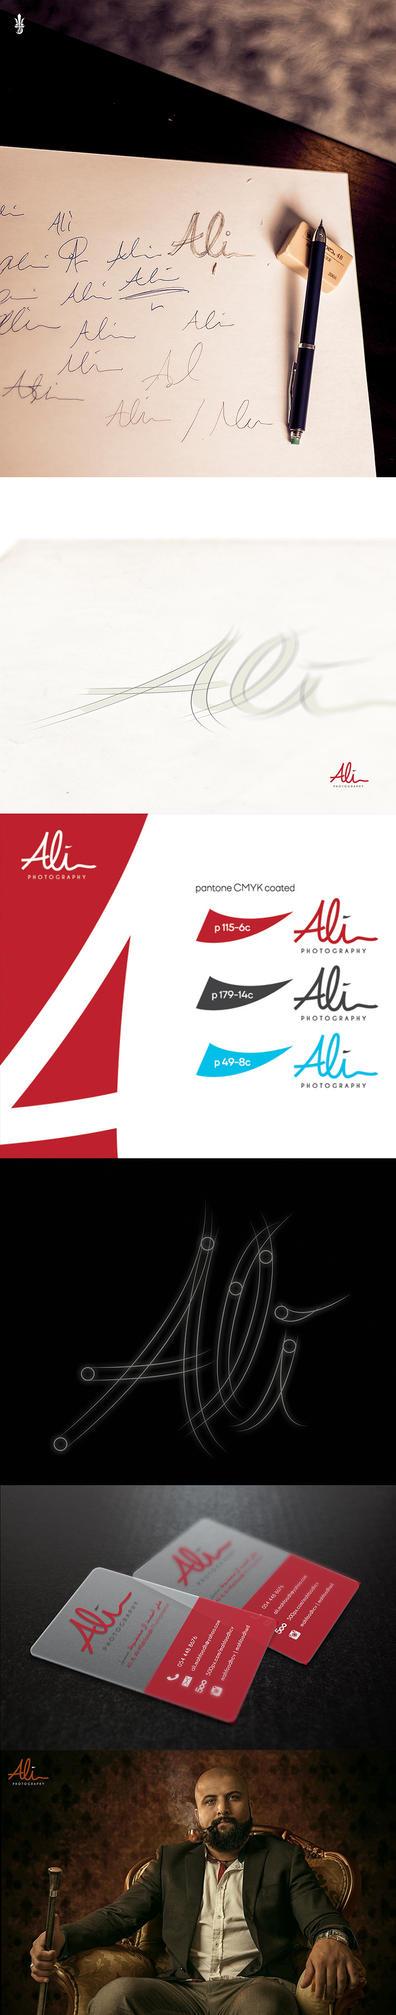 Ali Mahfoodh Logo by Ultradragon